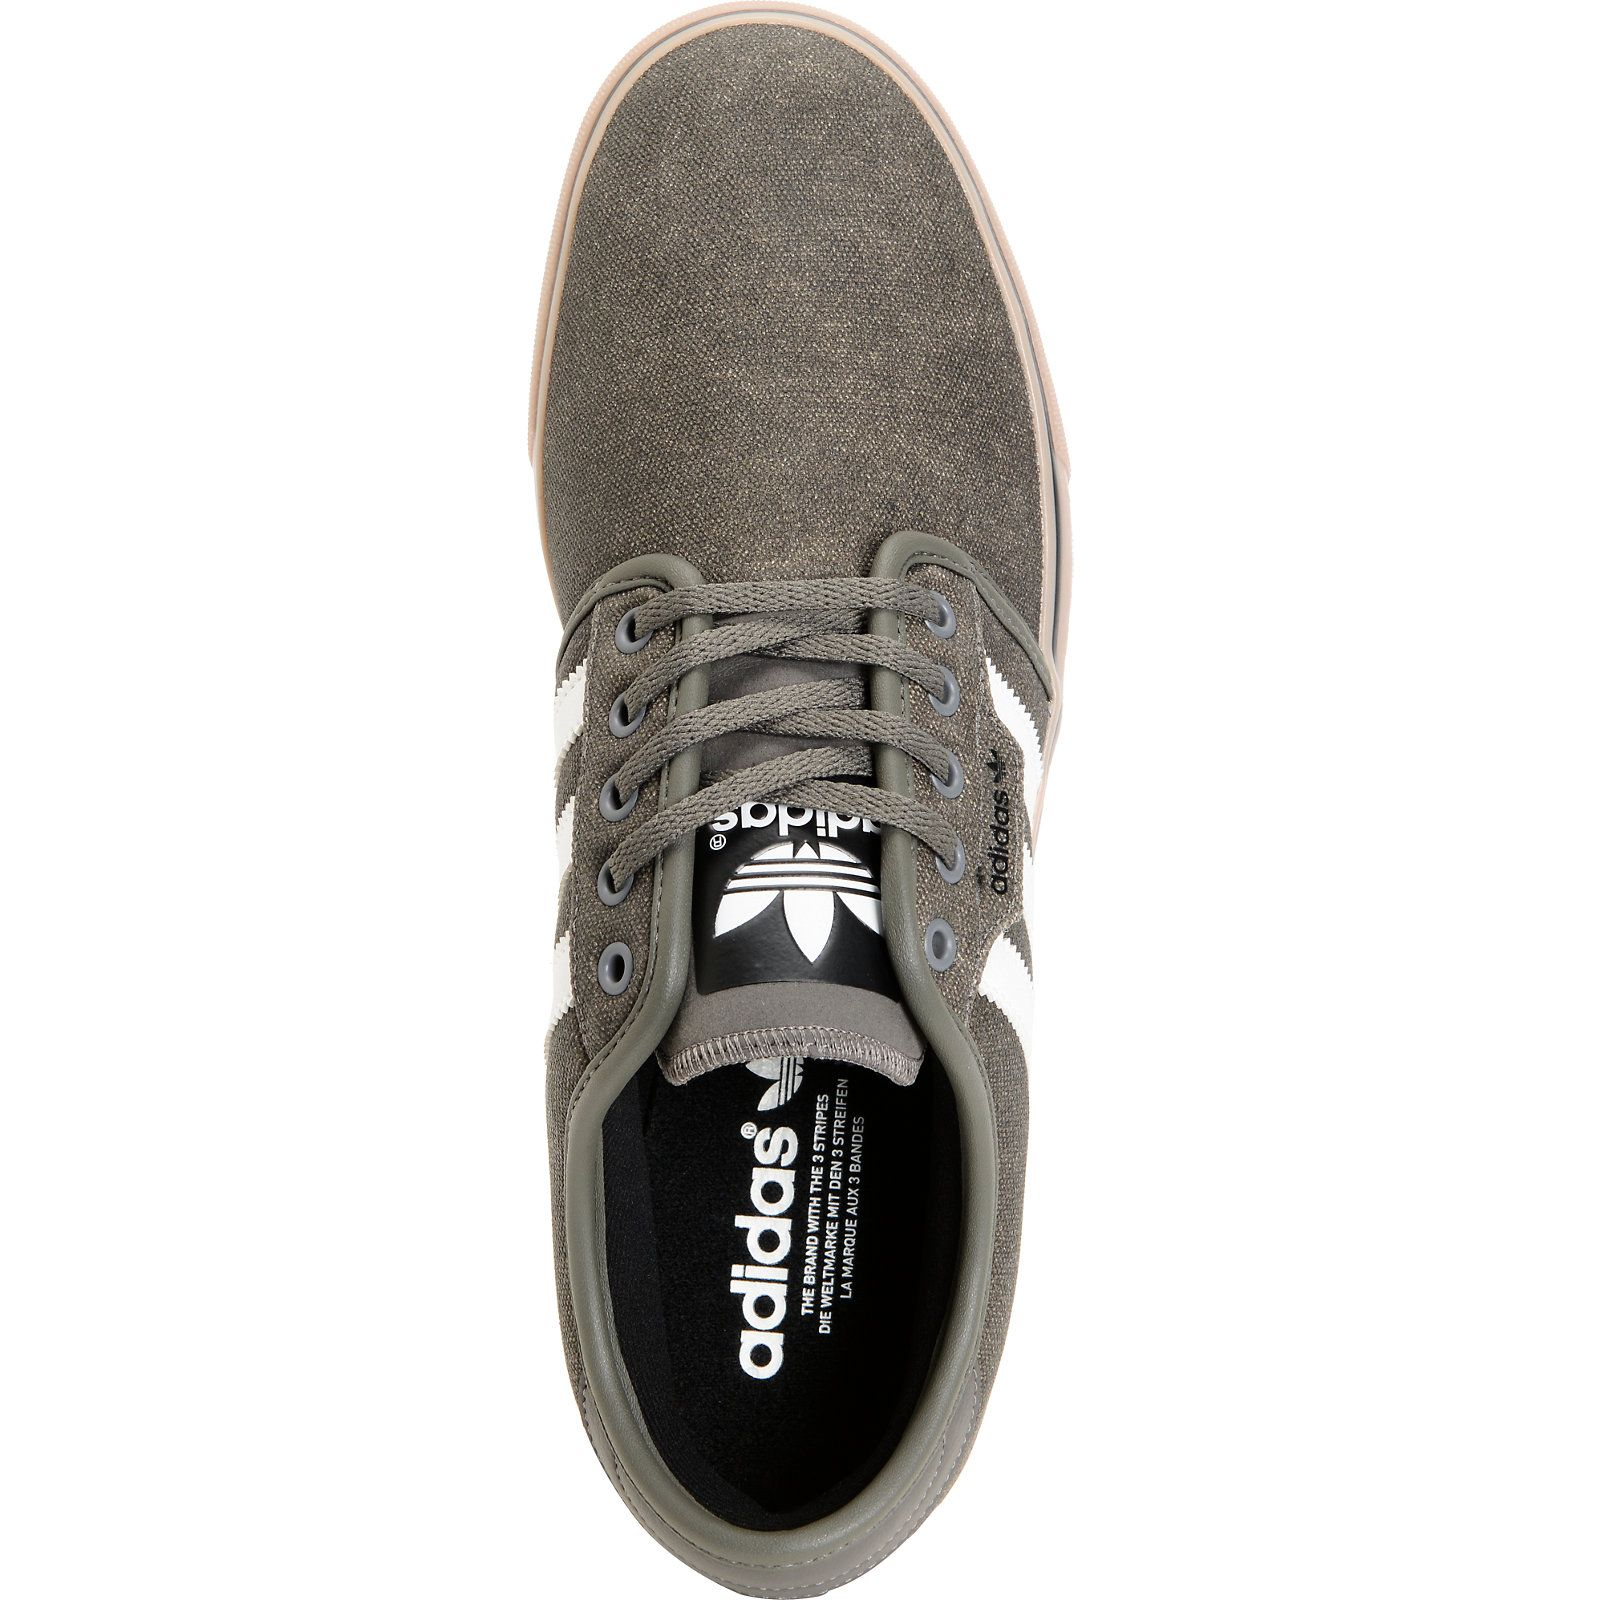 Adidas skate shoes zumiez - Adidas Seeley Mid Cinder Waxed Canvas Gum Shoe At Zumiez Pdp